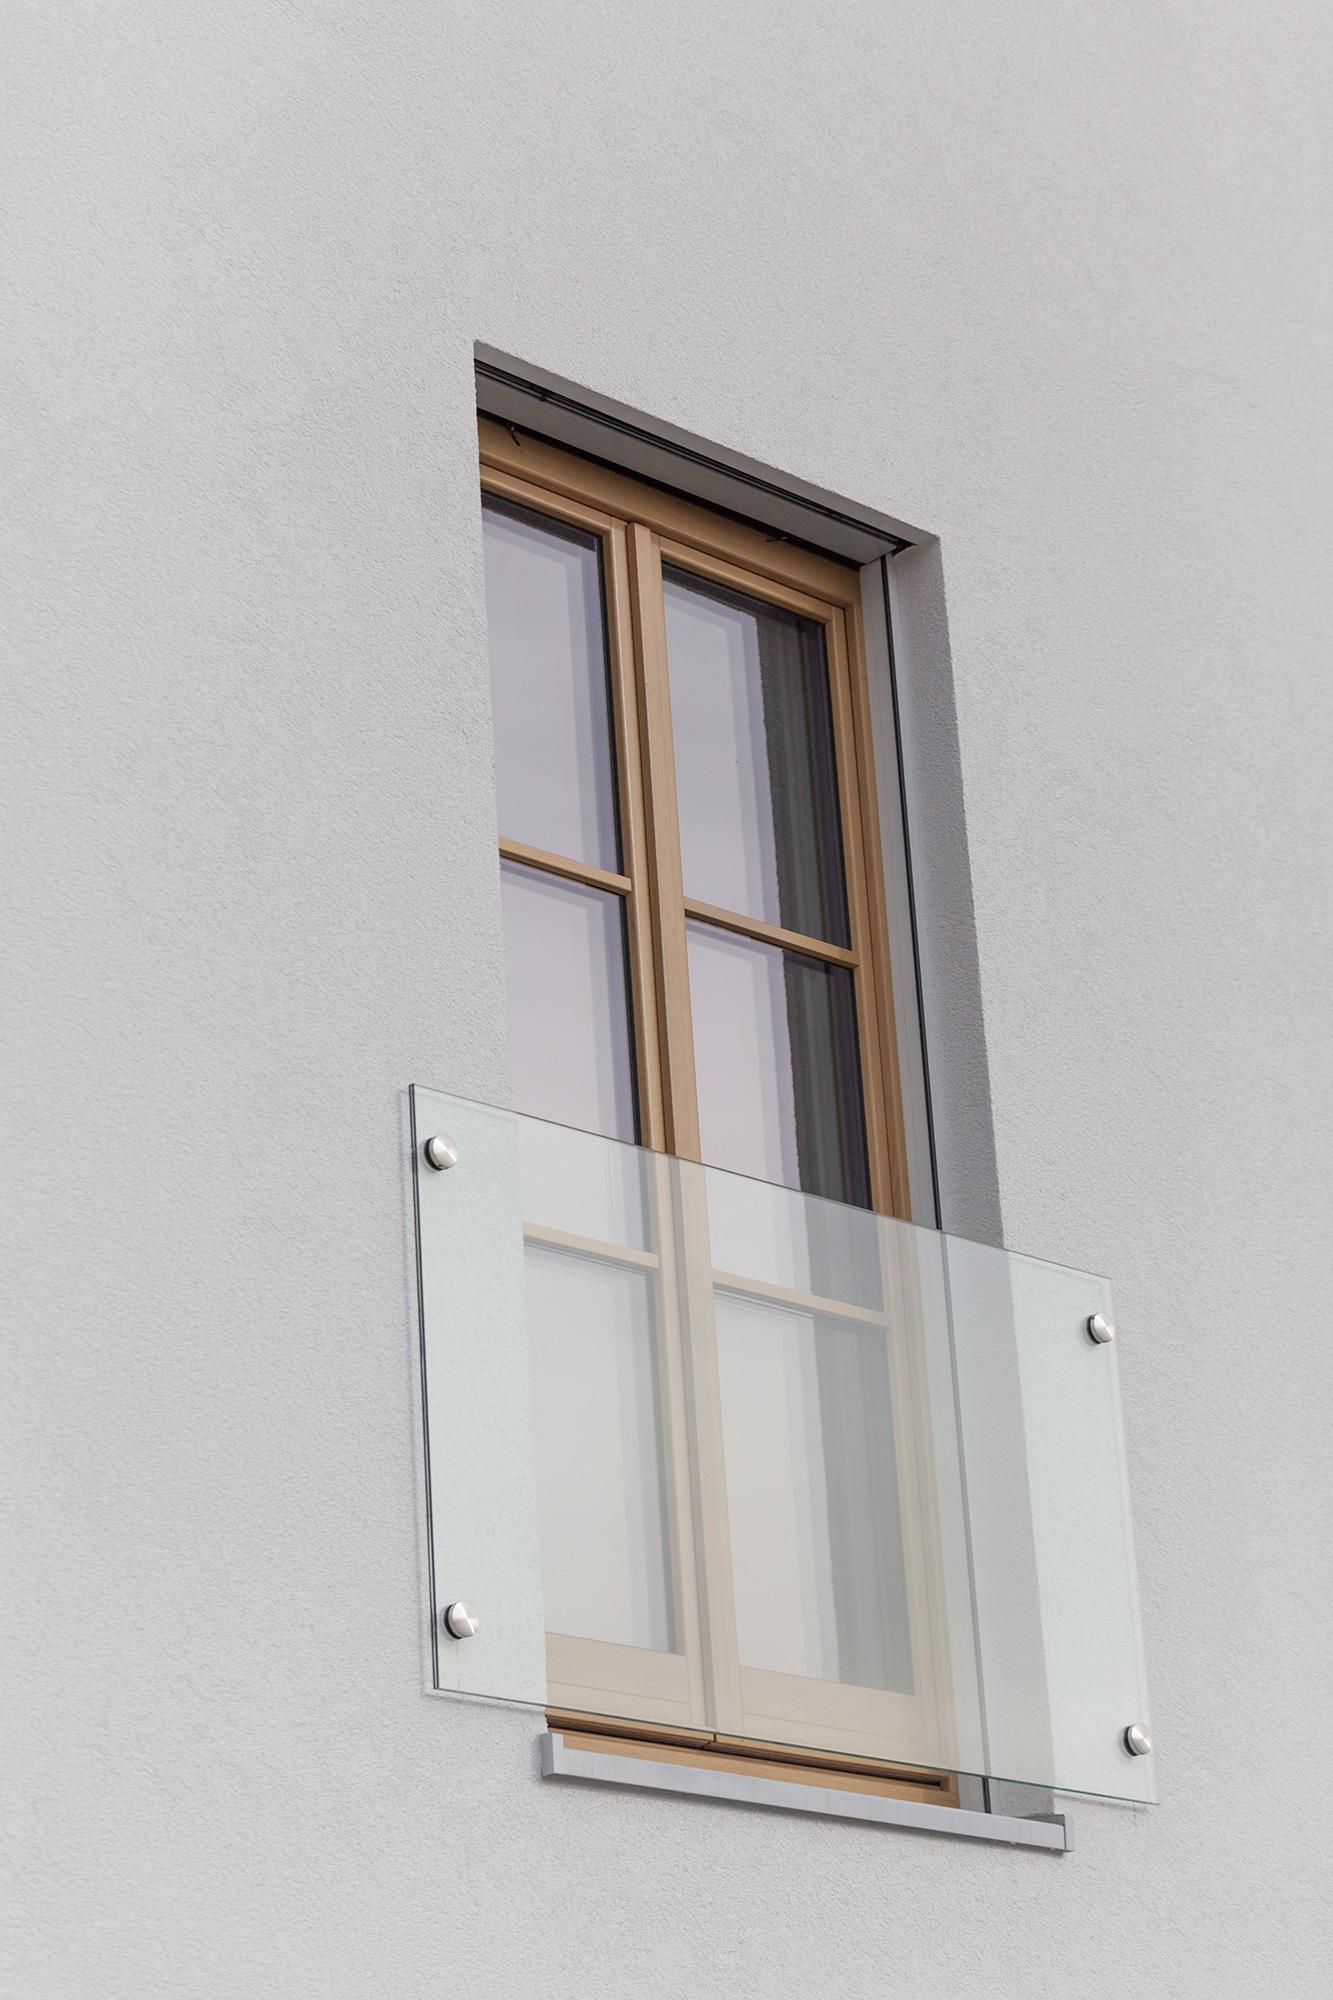 Holzfenster In Pforzheim Huchenfeld Pforzheimer Fensterbau